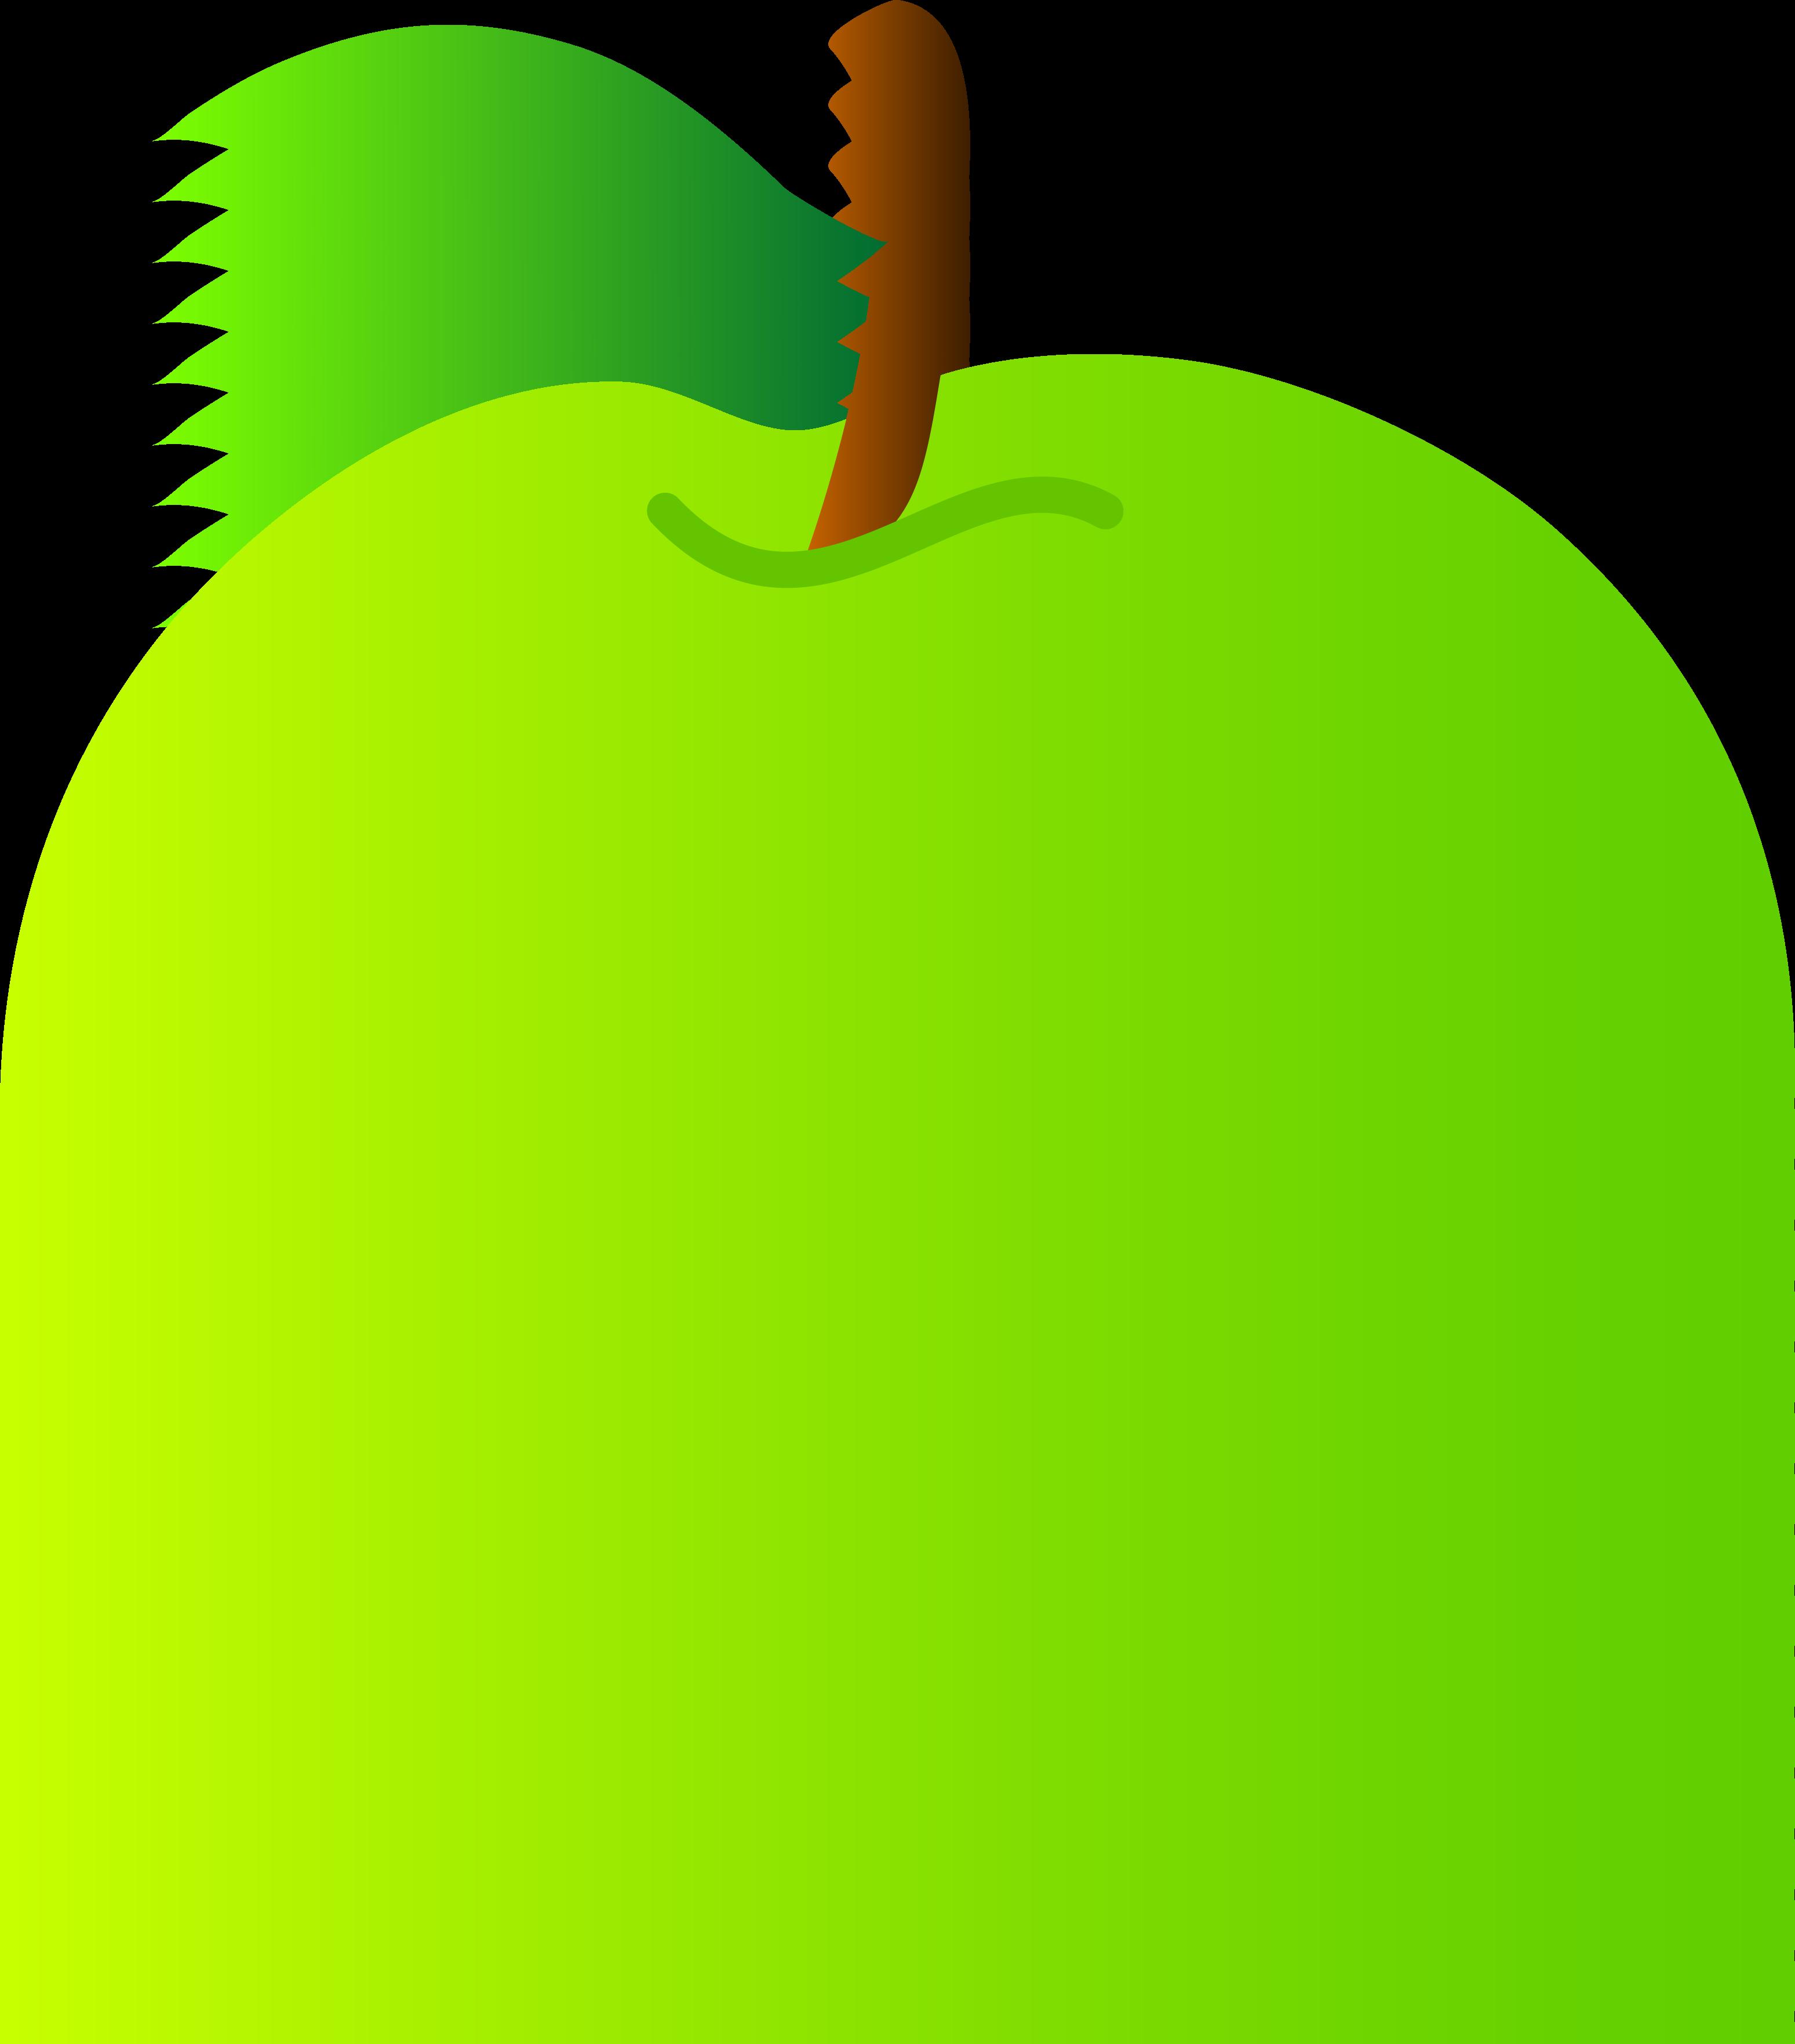 apple clipart green windows fasab granny